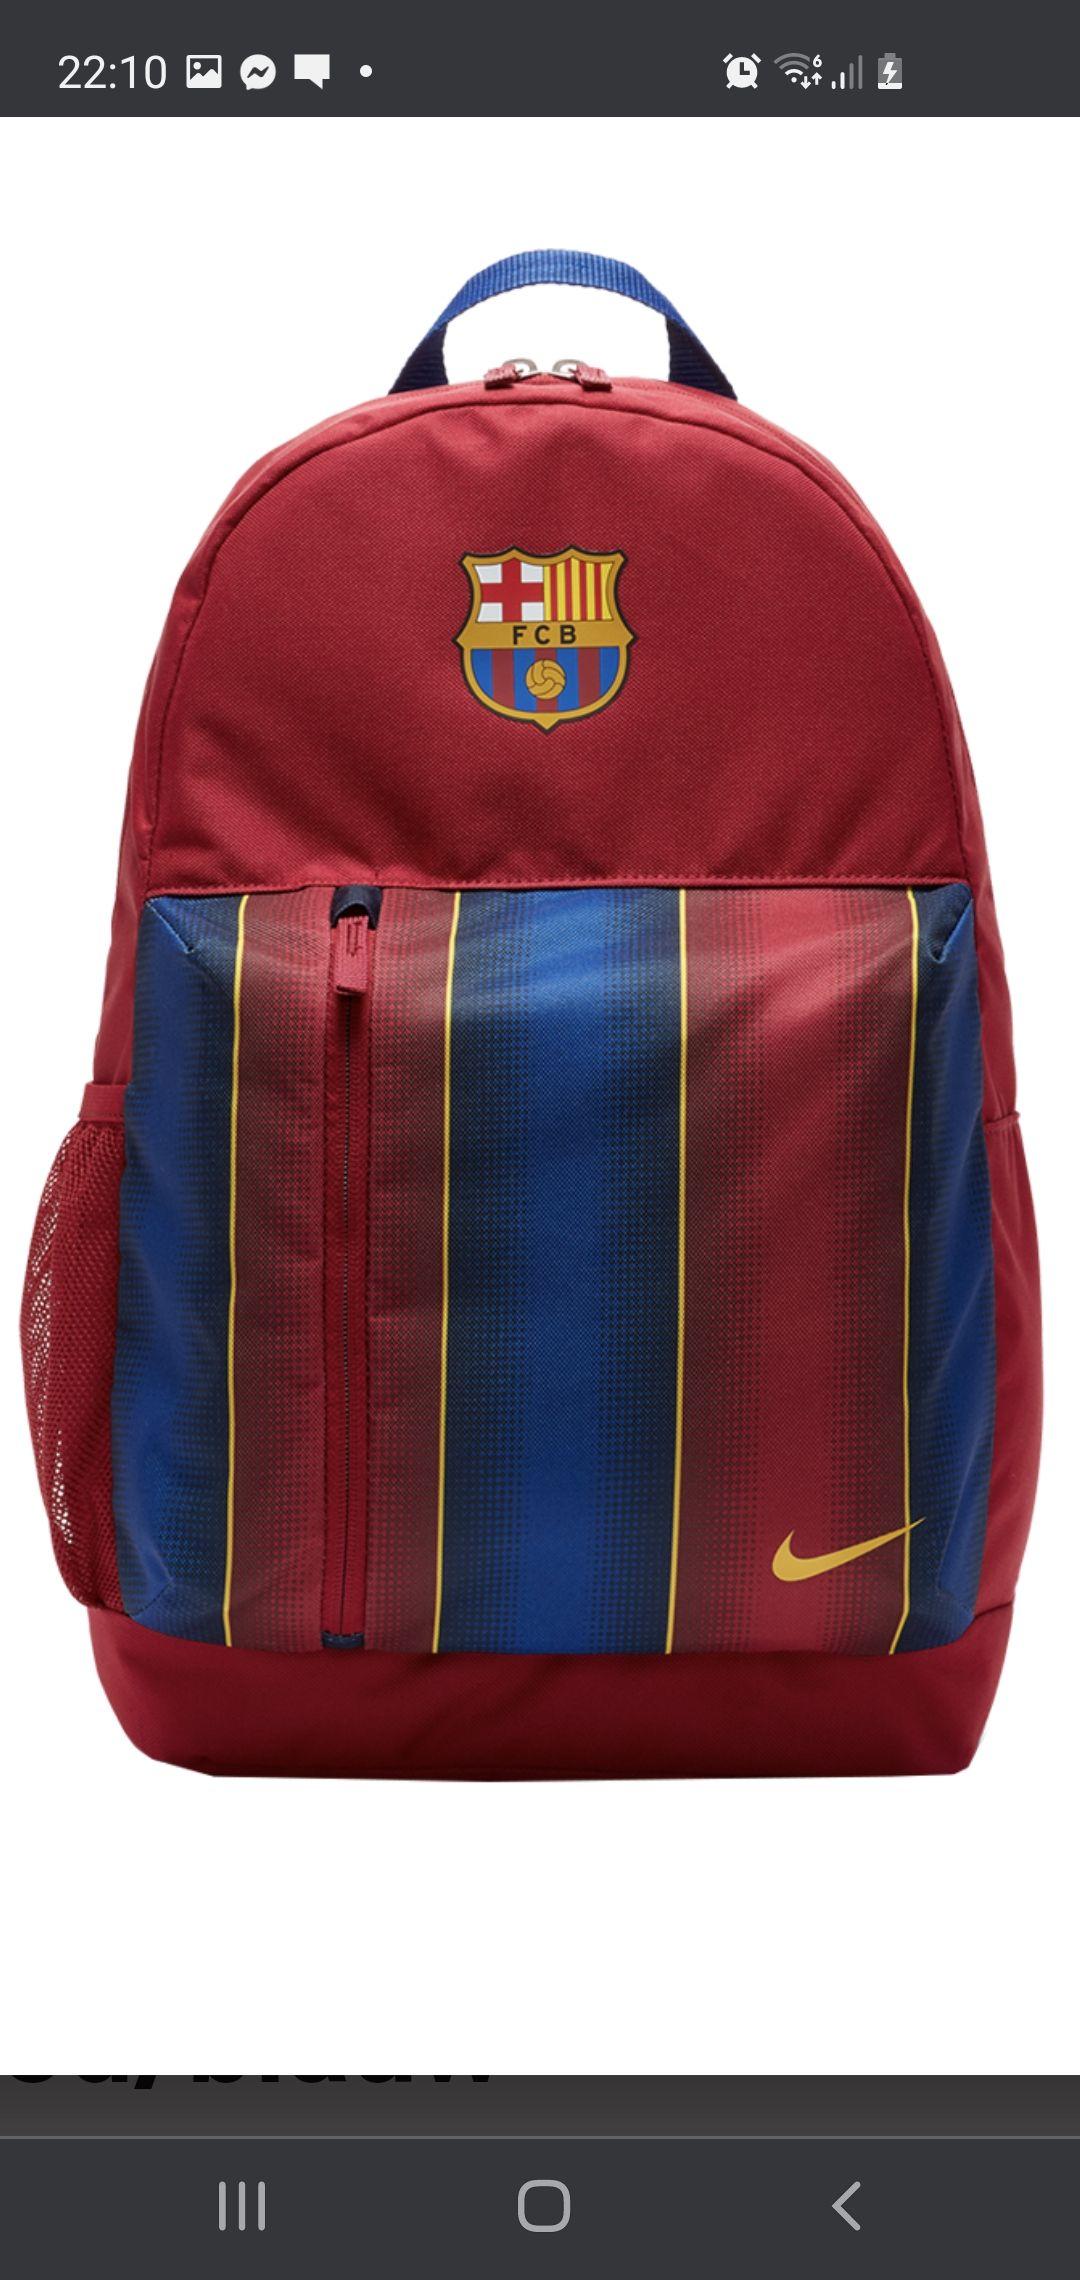 Nike Kids FC Barcelona Stadium backpack, Noble Red/Loyal Blue/Varsity Maize, approx. 46 x 30.5 x 12.5 cm